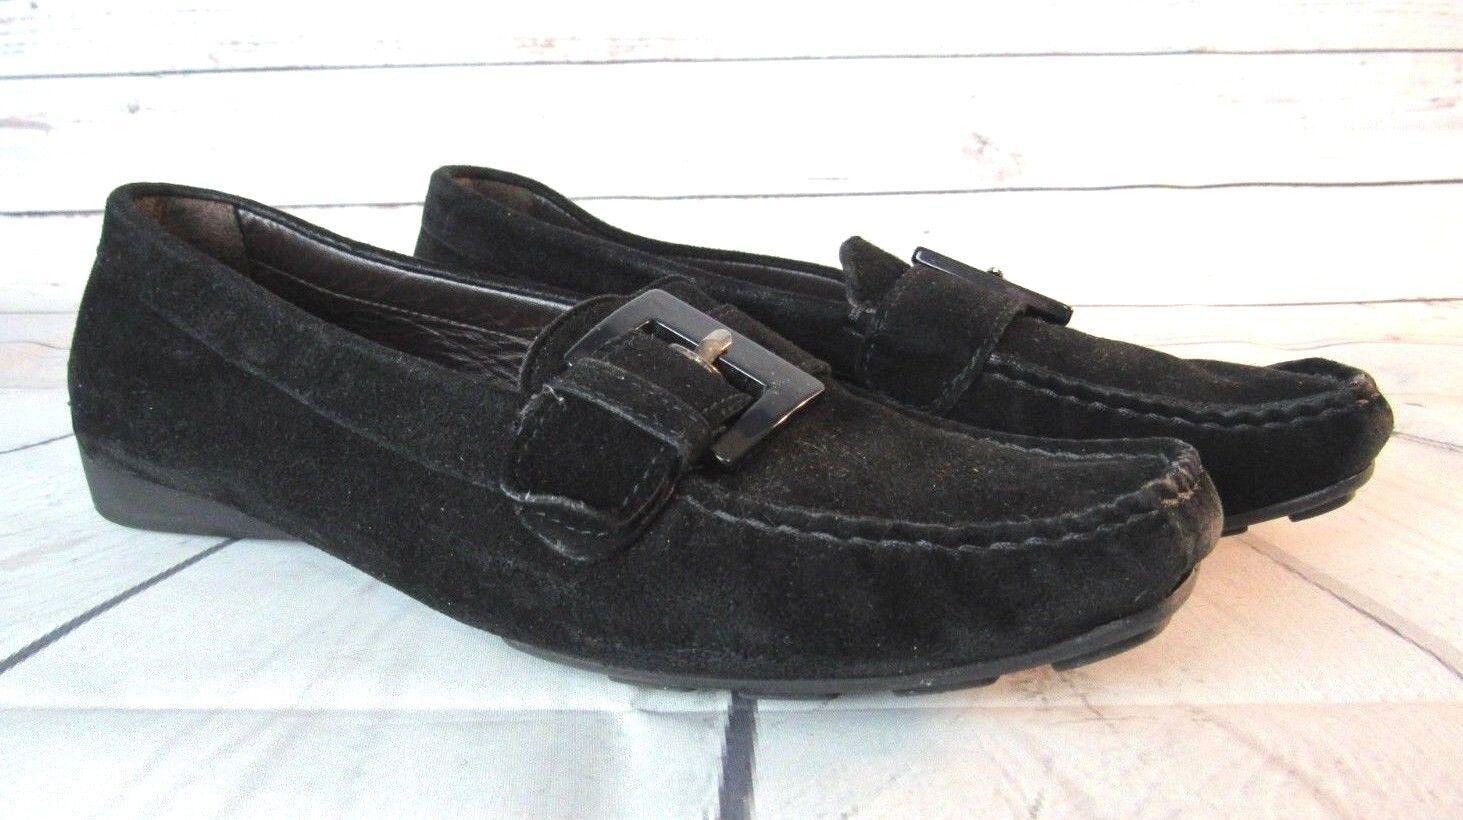 Stuart Weitzman Womens Black Suede Driving Loafers shoes US 6 - 6.5 EU 36 37